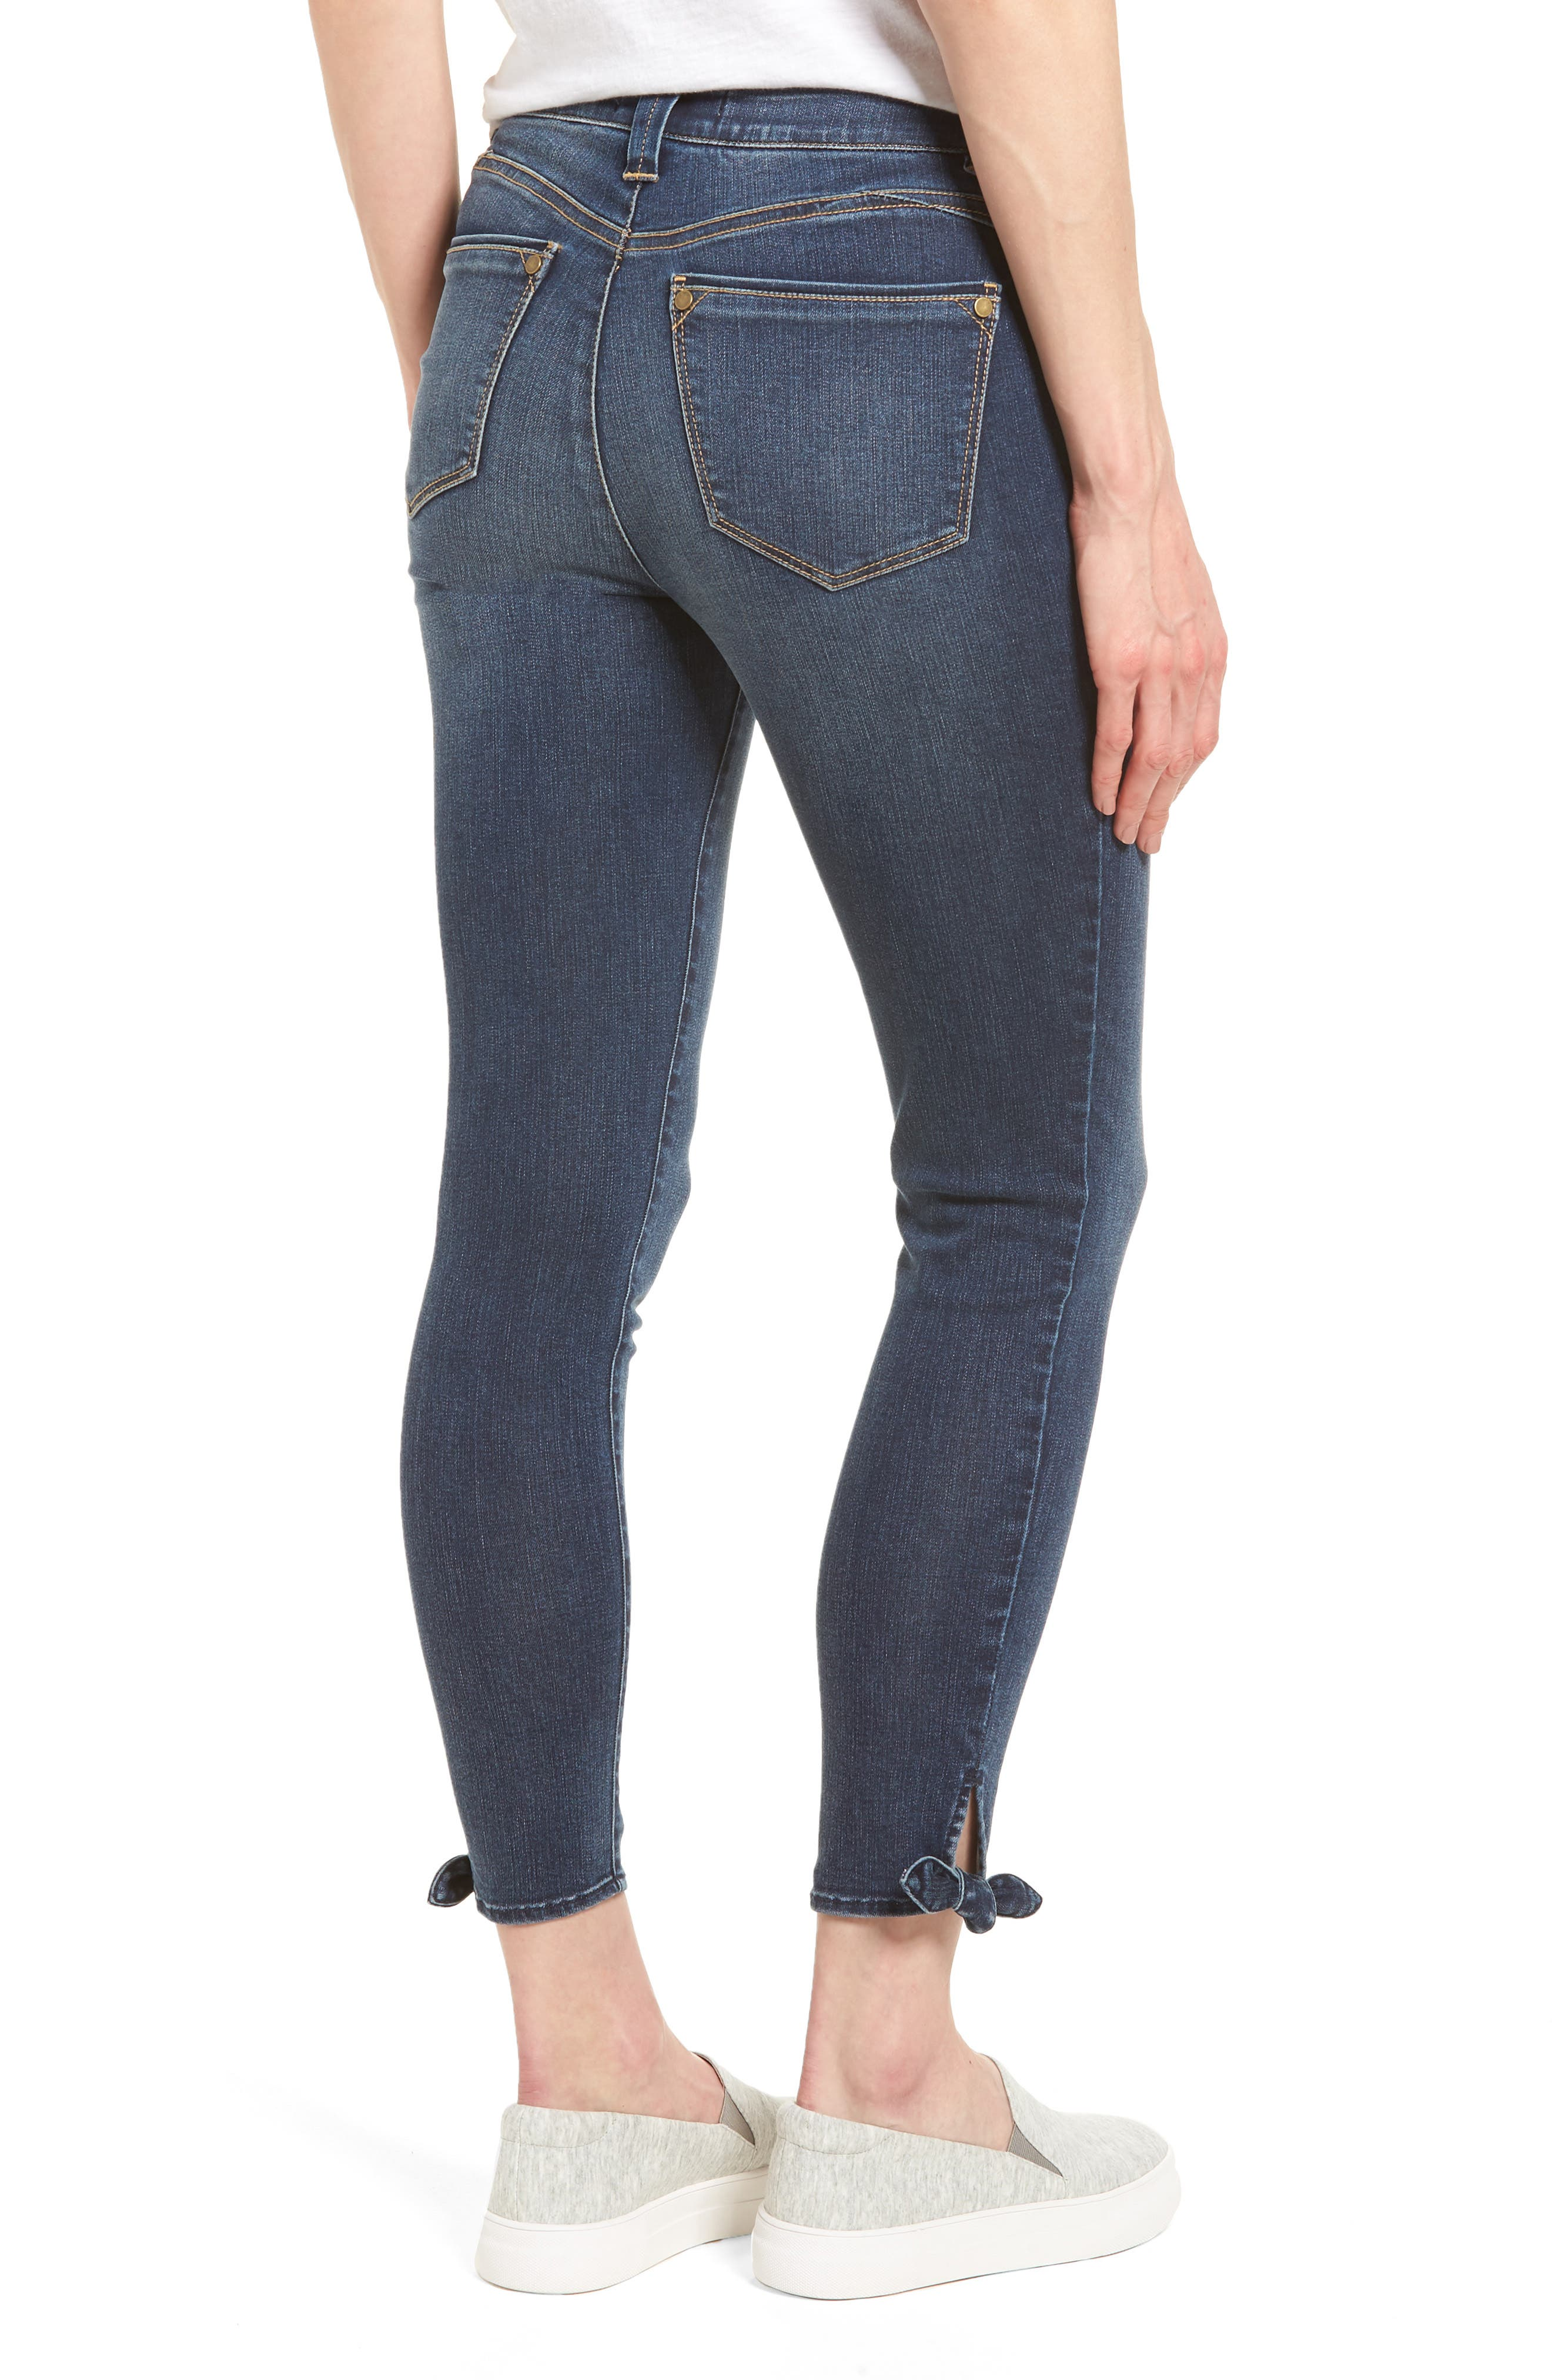 Ab-solution Ankle Skinny Skimmer Jeans,                             Alternate thumbnail 2, color,                             Bl- Blue